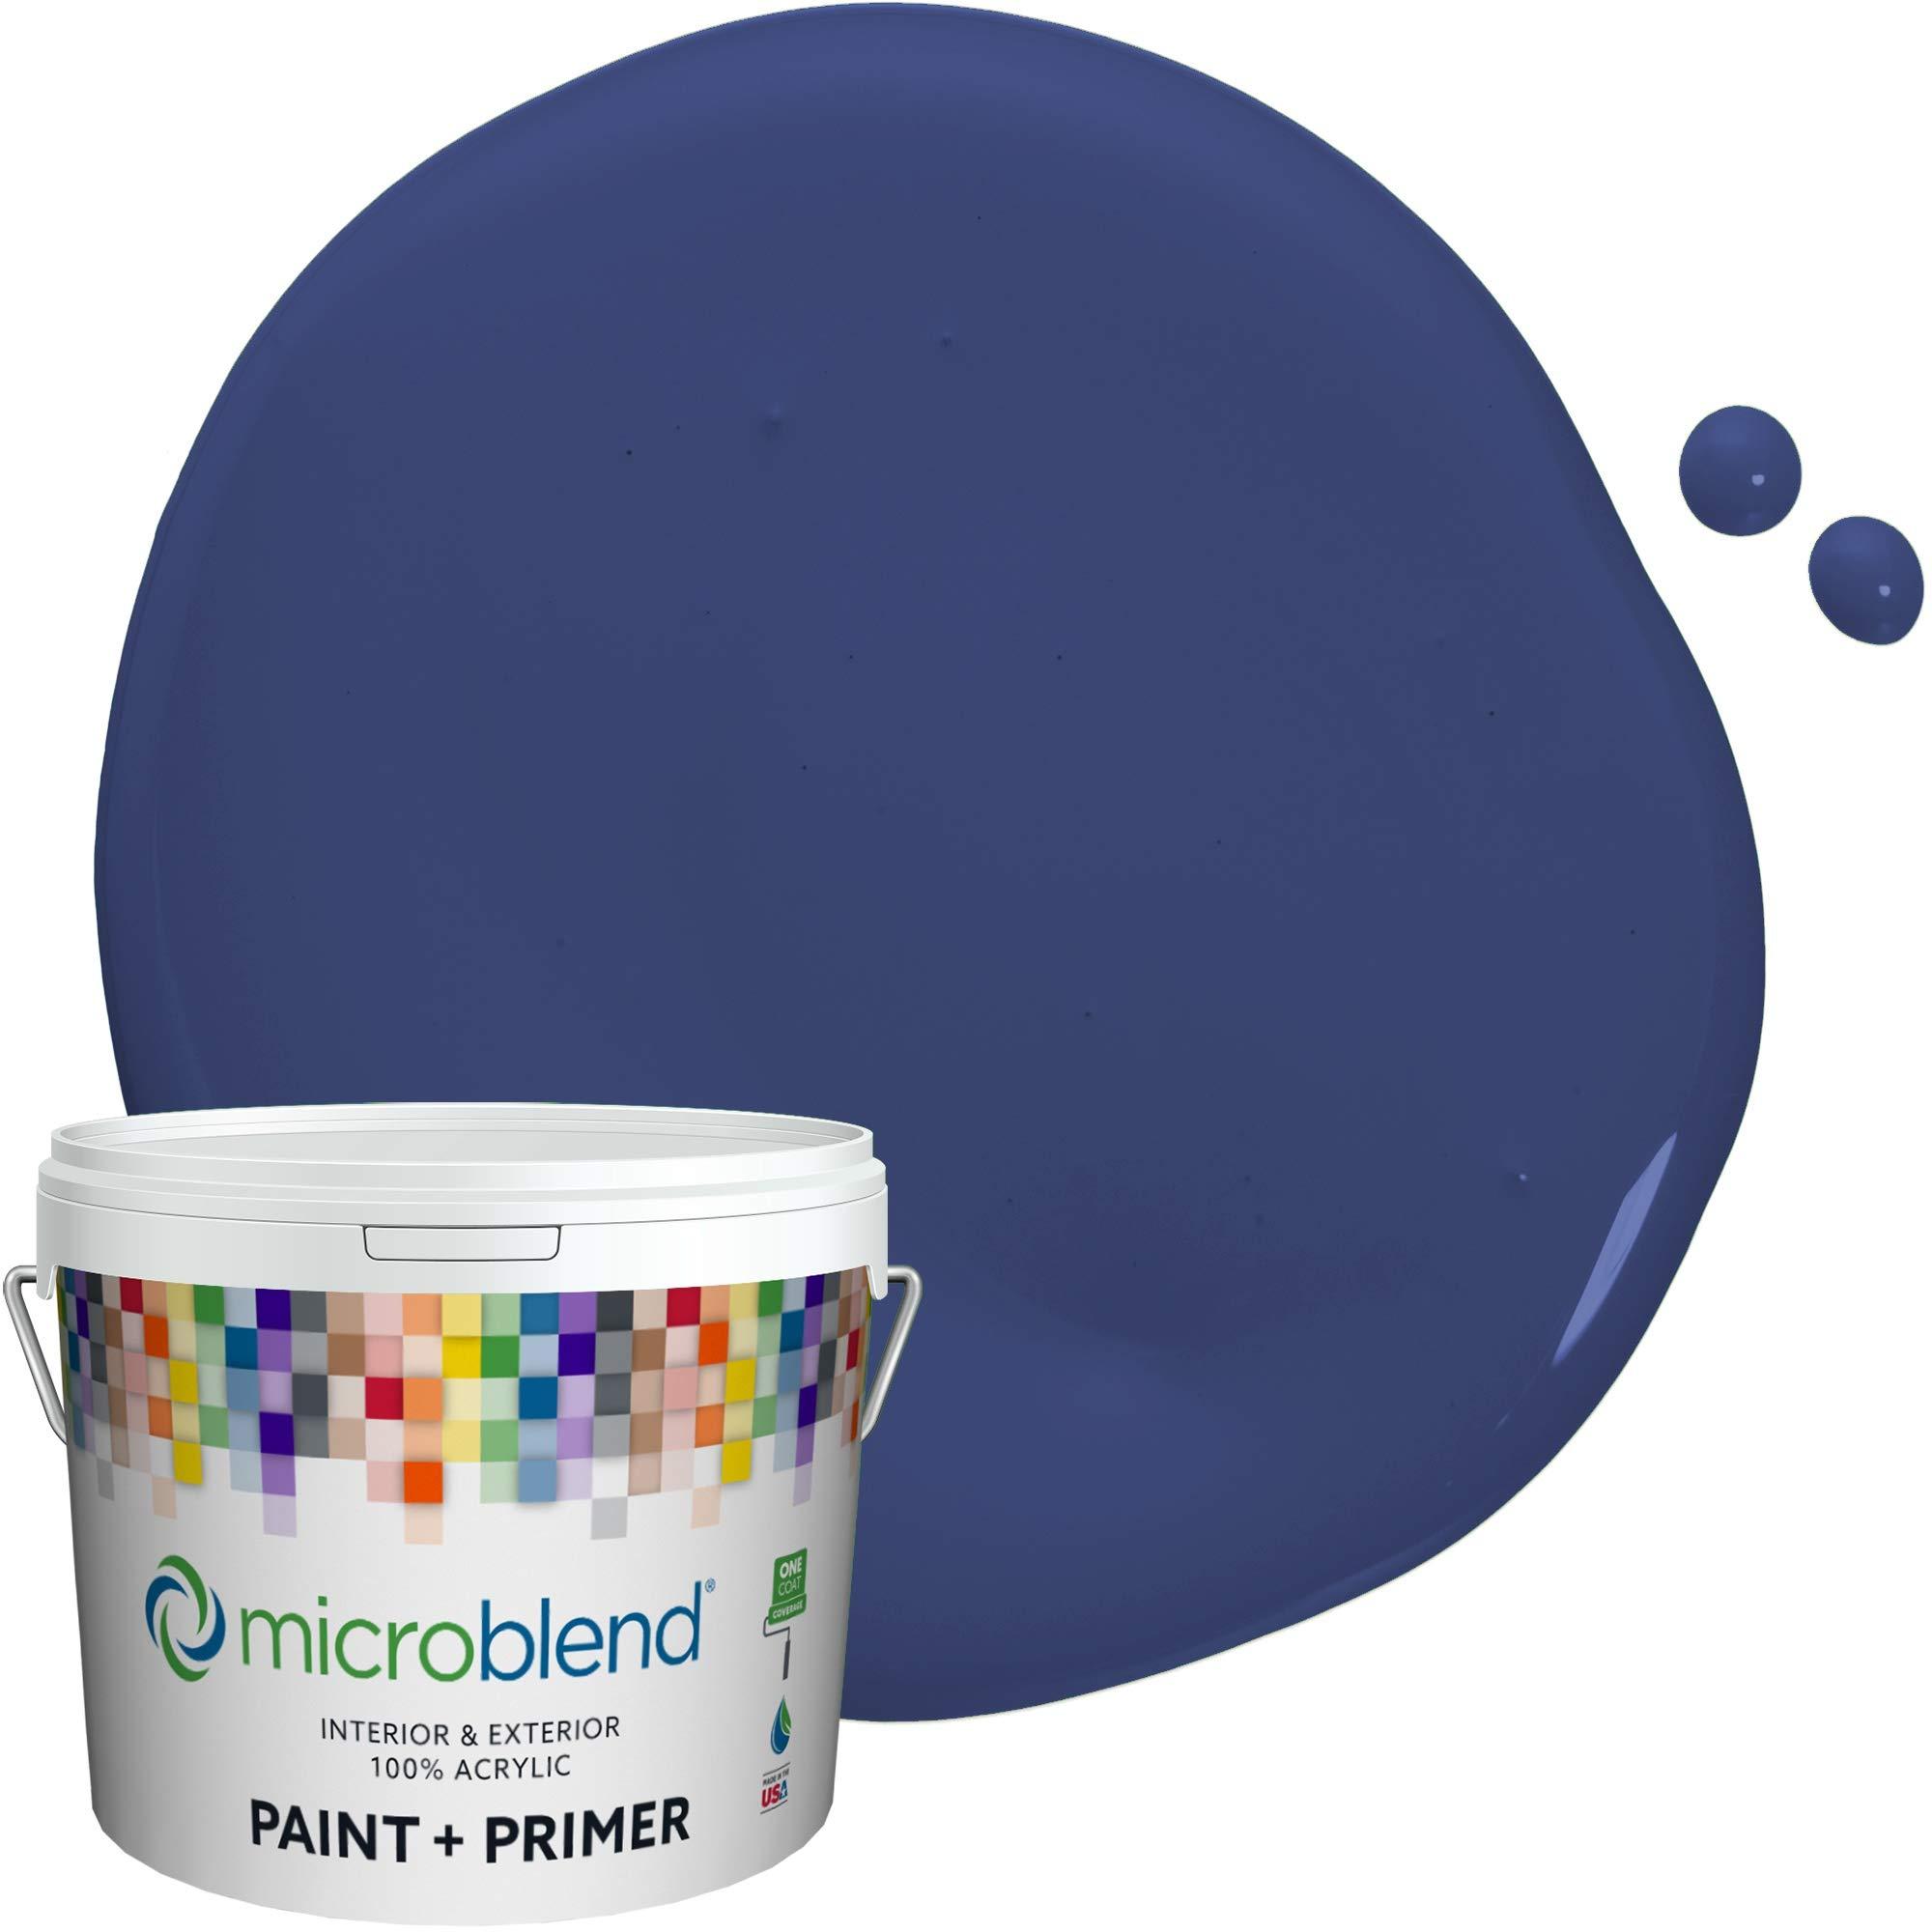 MicroBlend Exterior Paint + Primer, Blue Laser, Flat Sheen, 1 Gallon, Custom Made, Premium Quality One Coat Hide & Washable Paint